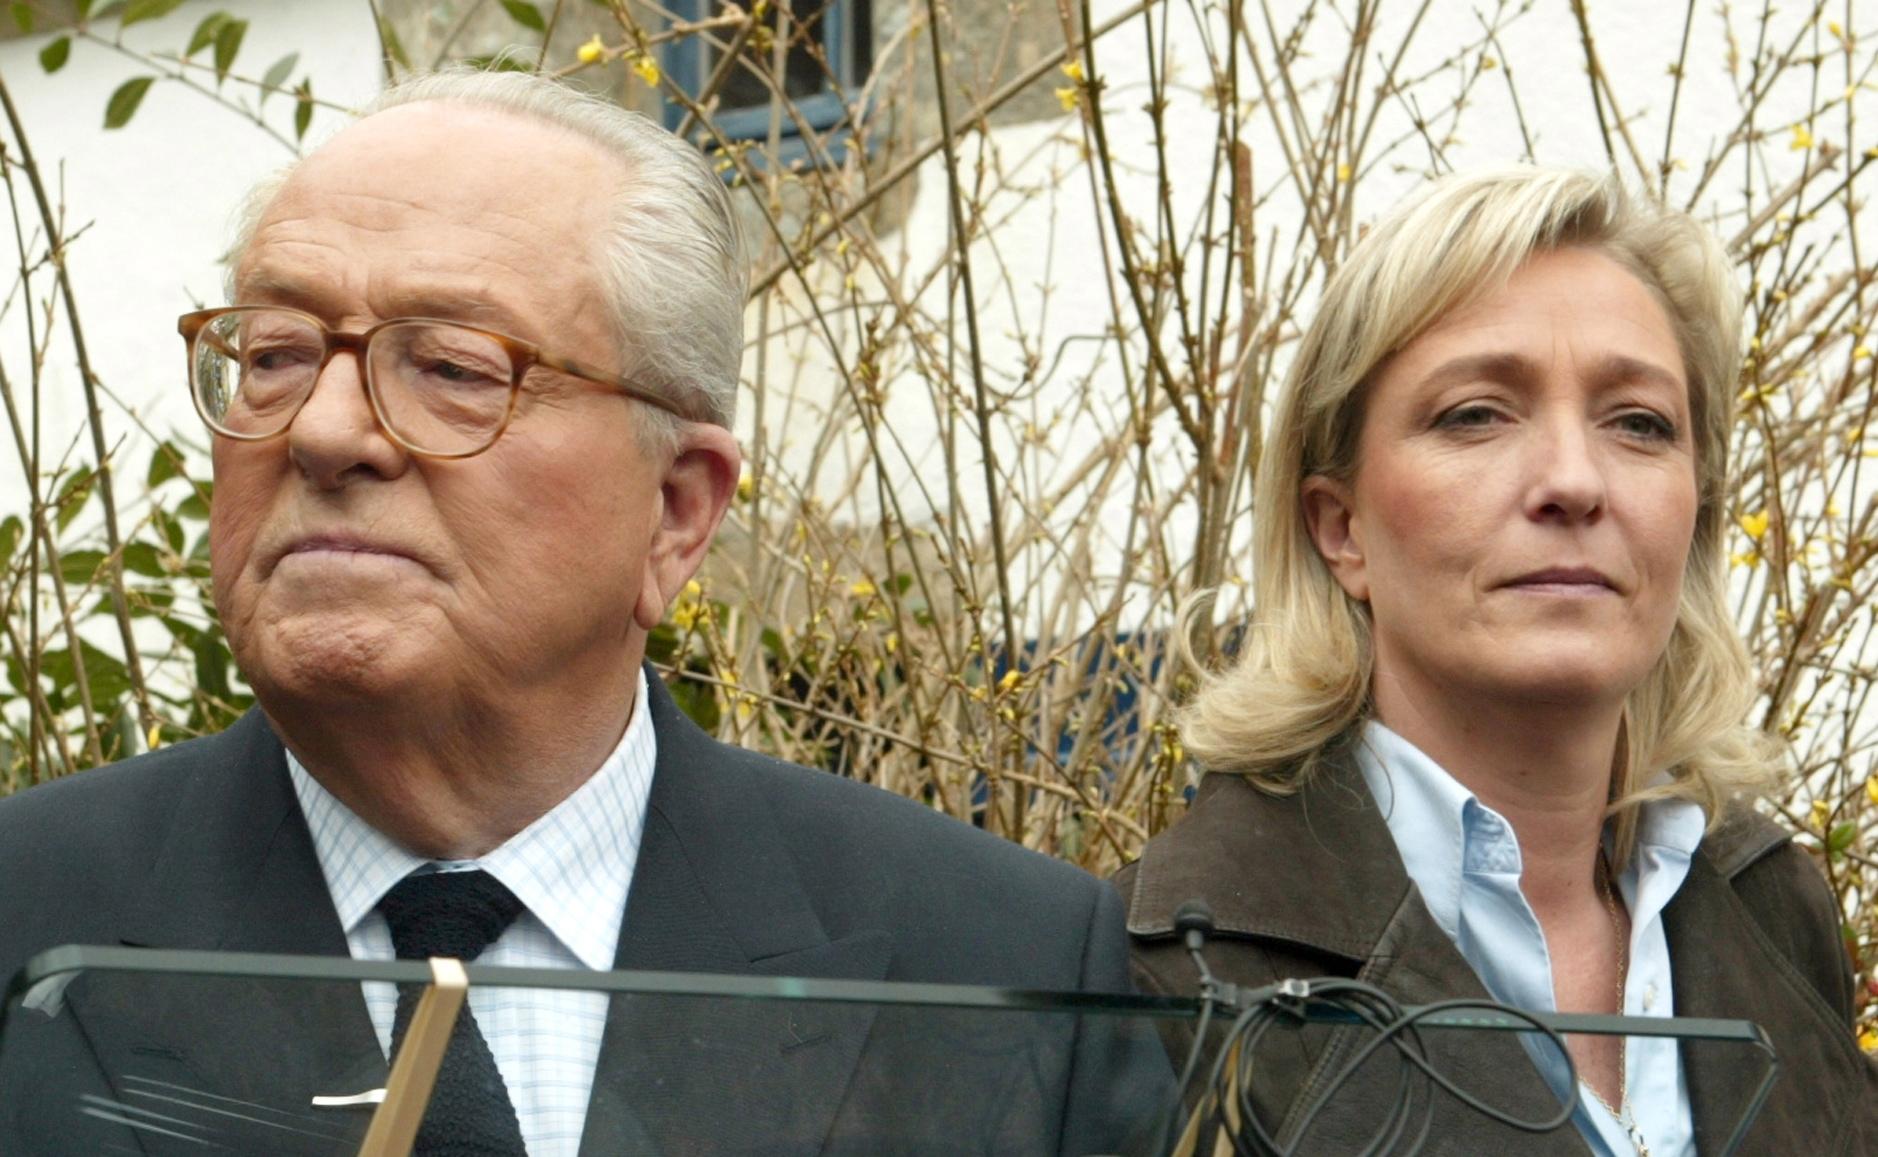 Jean-Marie-Le-Pen-and-his-daughter-Marine-Le-Pen